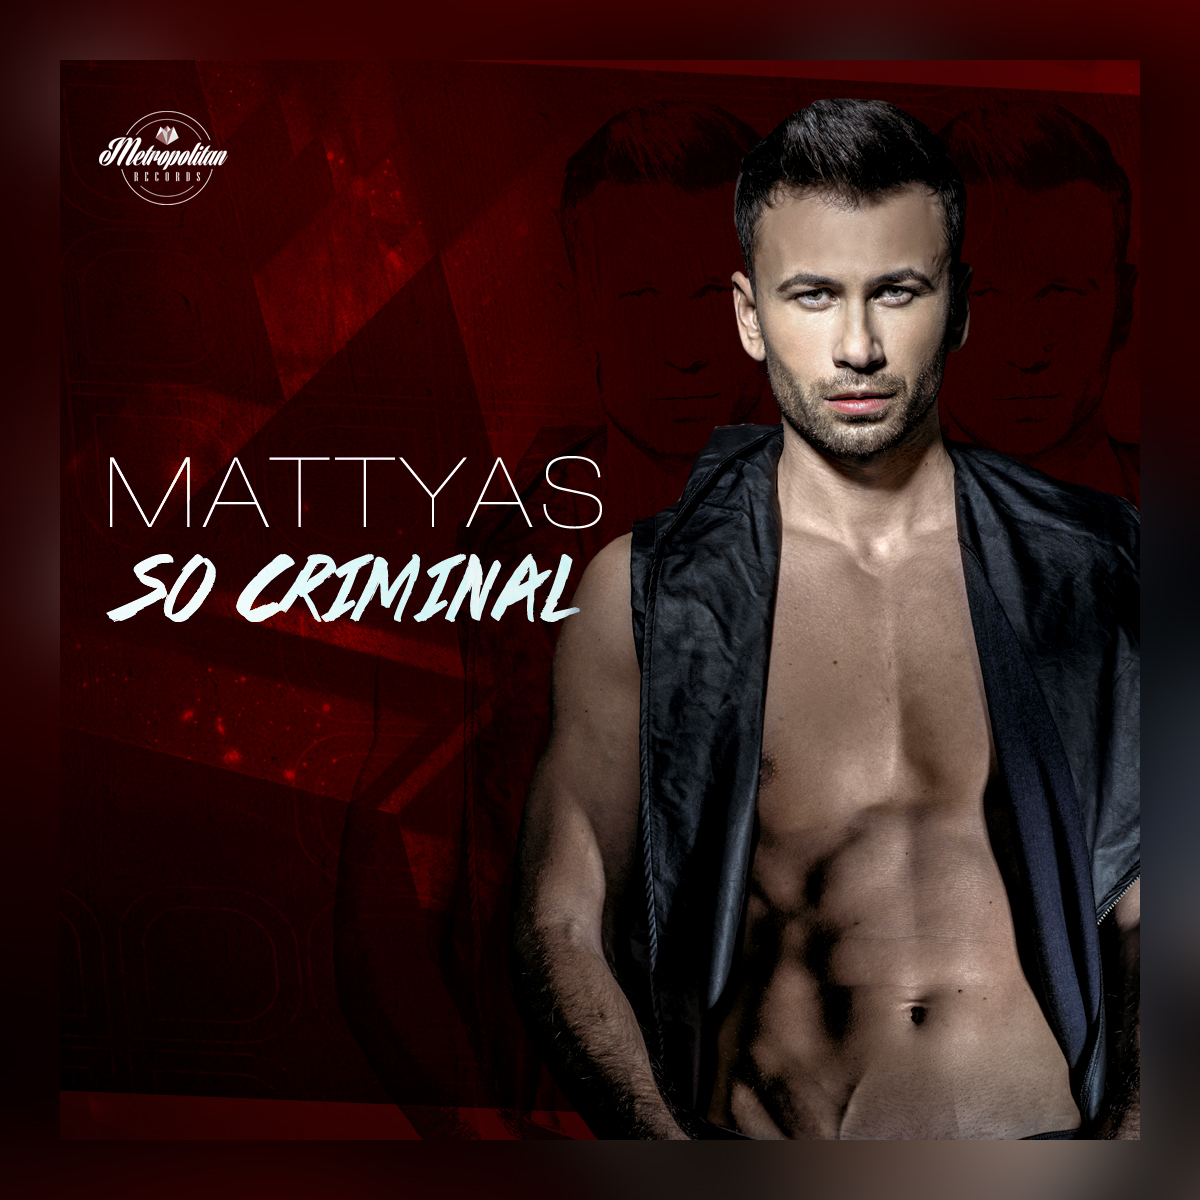 mattyascriminalarticol {focus_keyword} Mattyas - So Criminal (single nou) mattyascriminalarticol